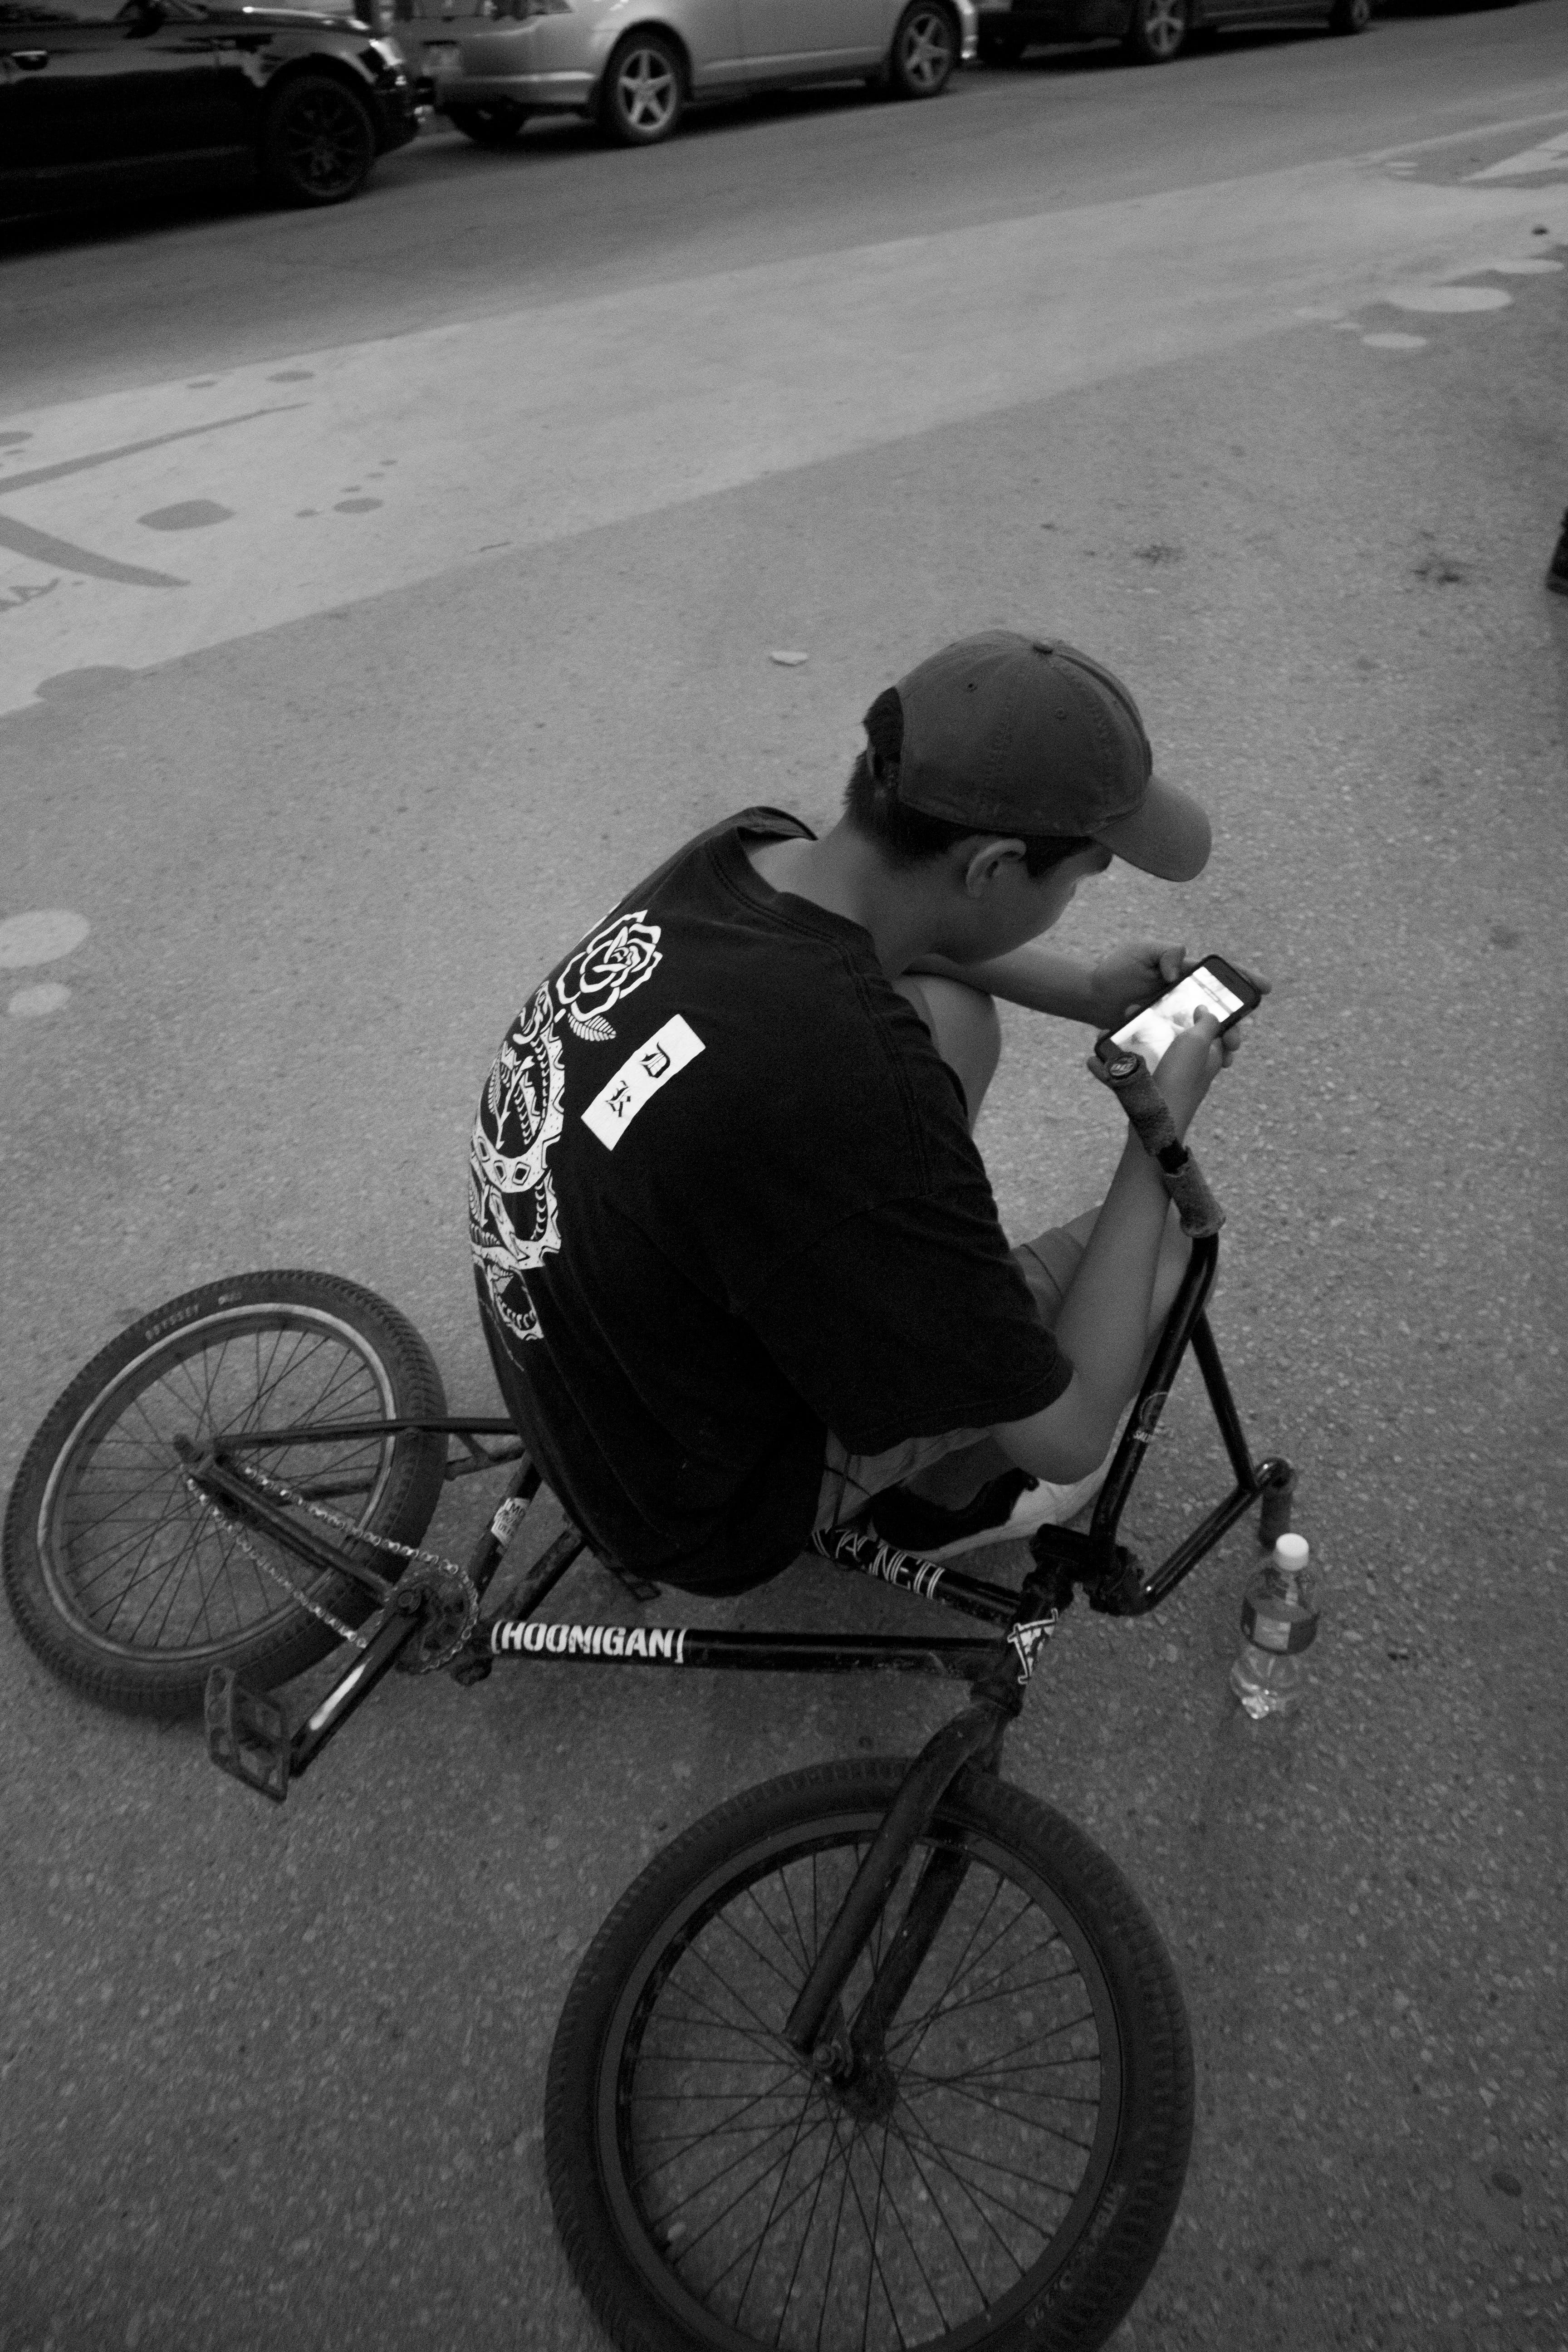 Free stock photo of road, sitting, bike, boy